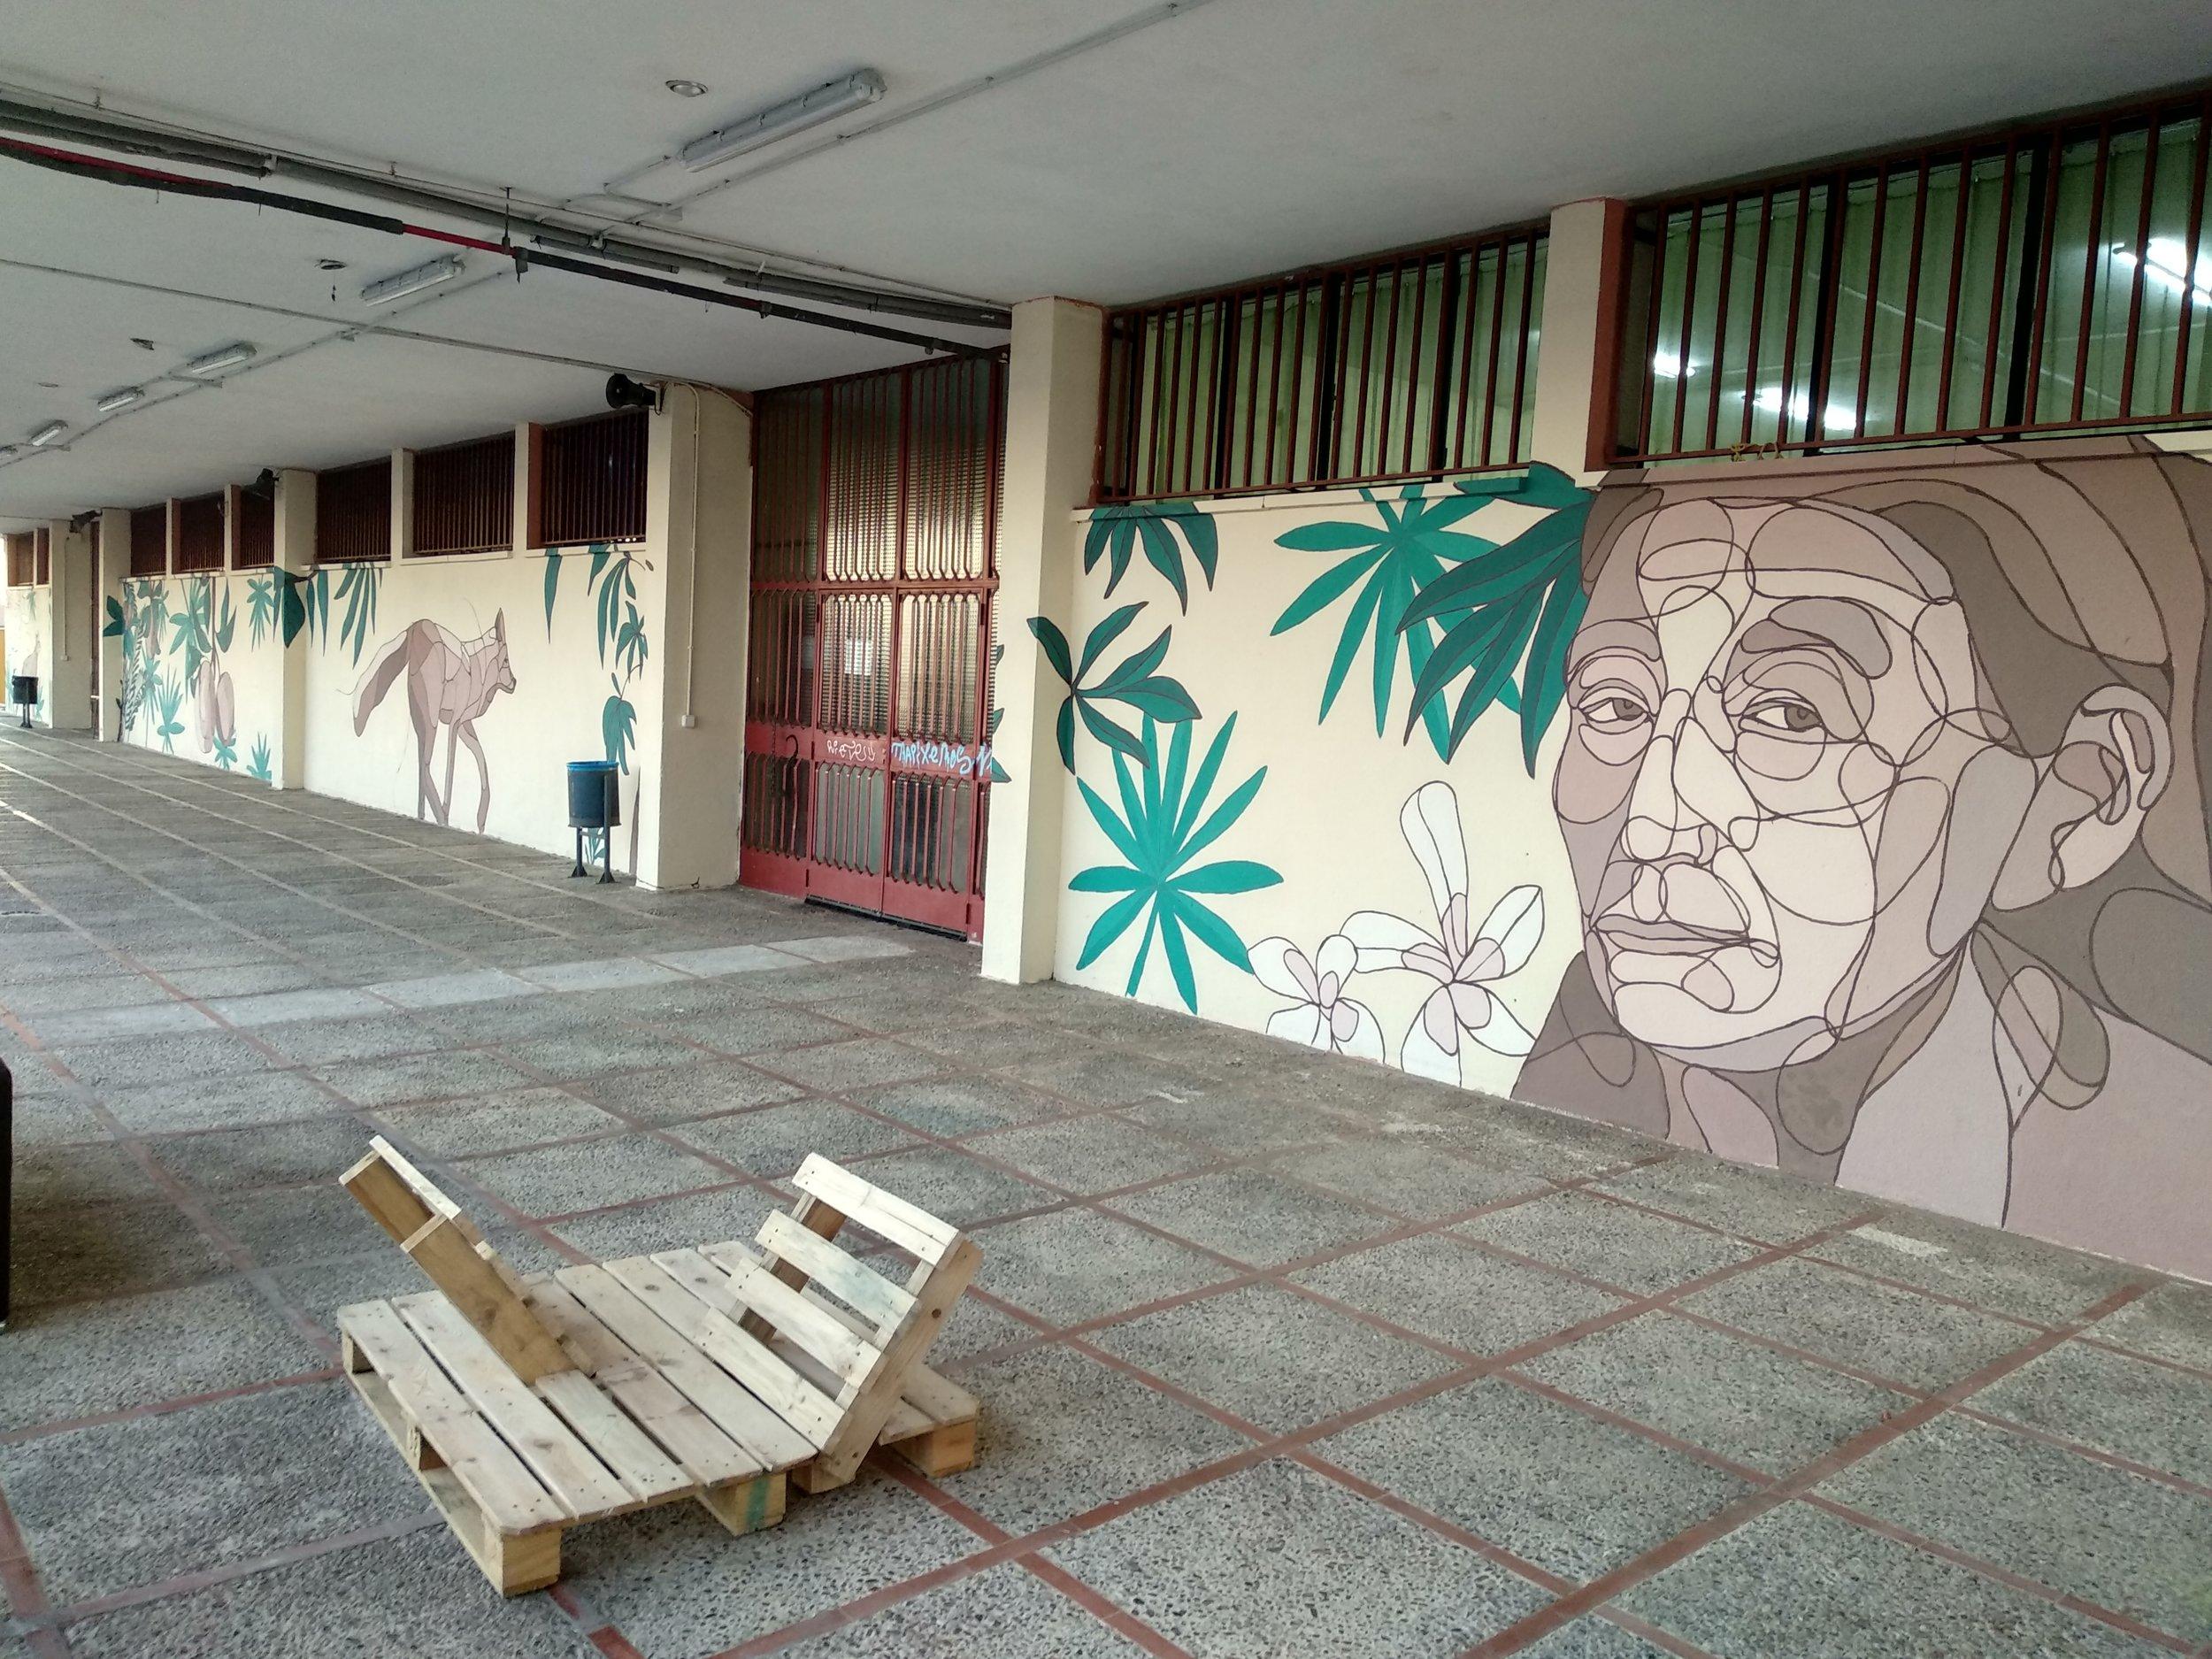 Centro Comunitario Guatemala, Madrid, Spain 2019